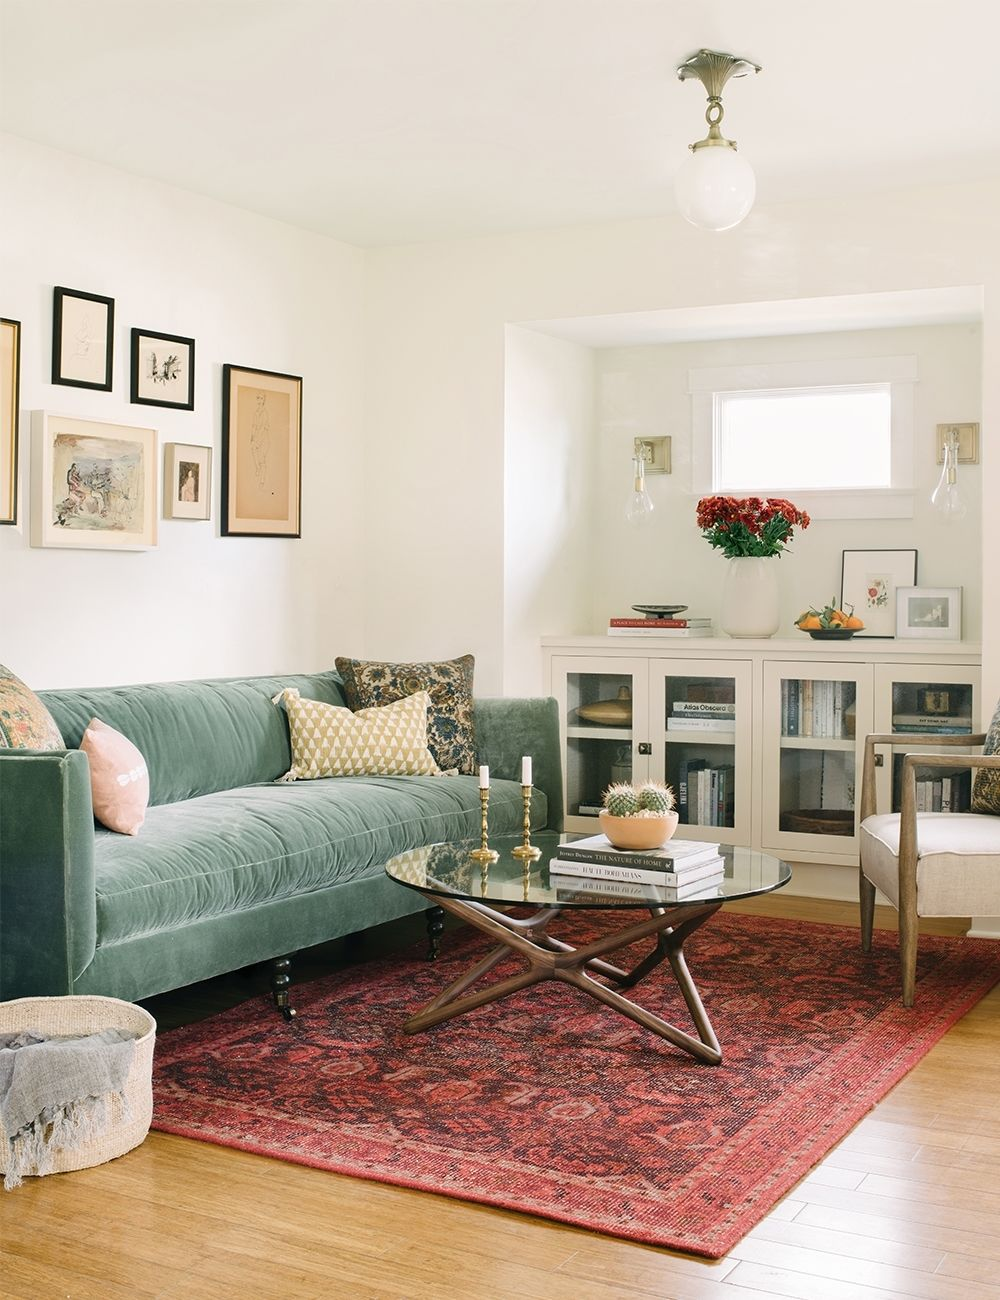 14+ Beautiful Sage Green Velvet Sofa Options - IMAGE via Lulu and Georgia feat. 'Fabienne' Sofa in Moss, Design: Ginny Macdonald, Photography: Lauren Pressey